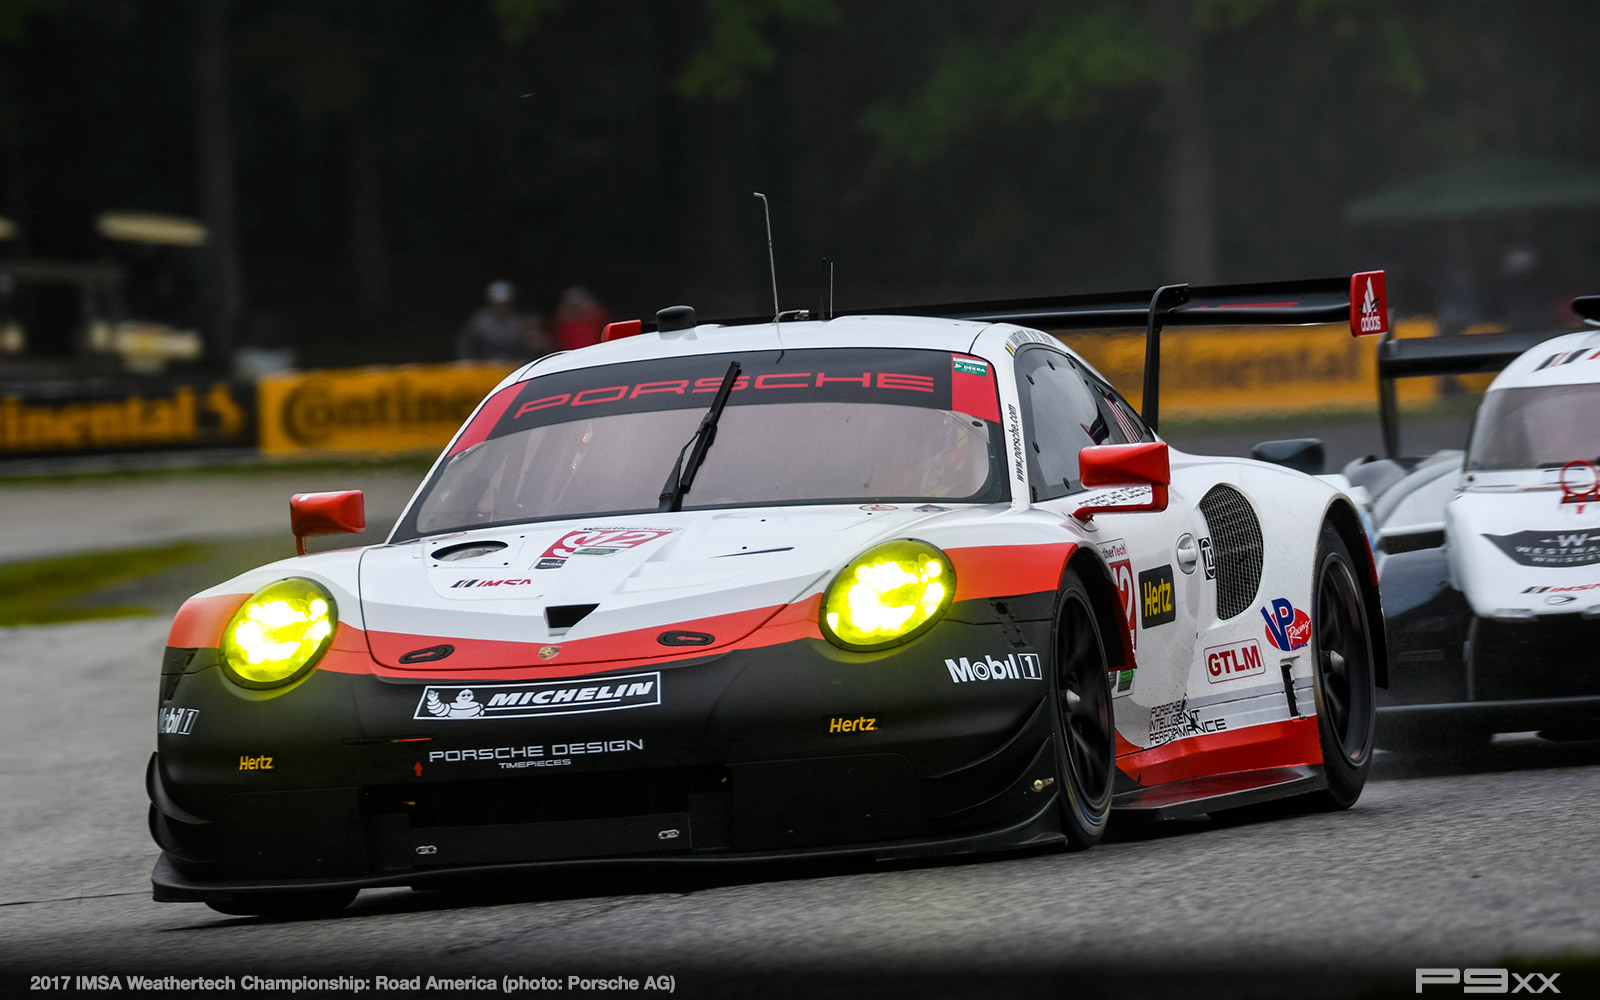 2017-IMSA-Weathertech-Road-America-Porsche-290